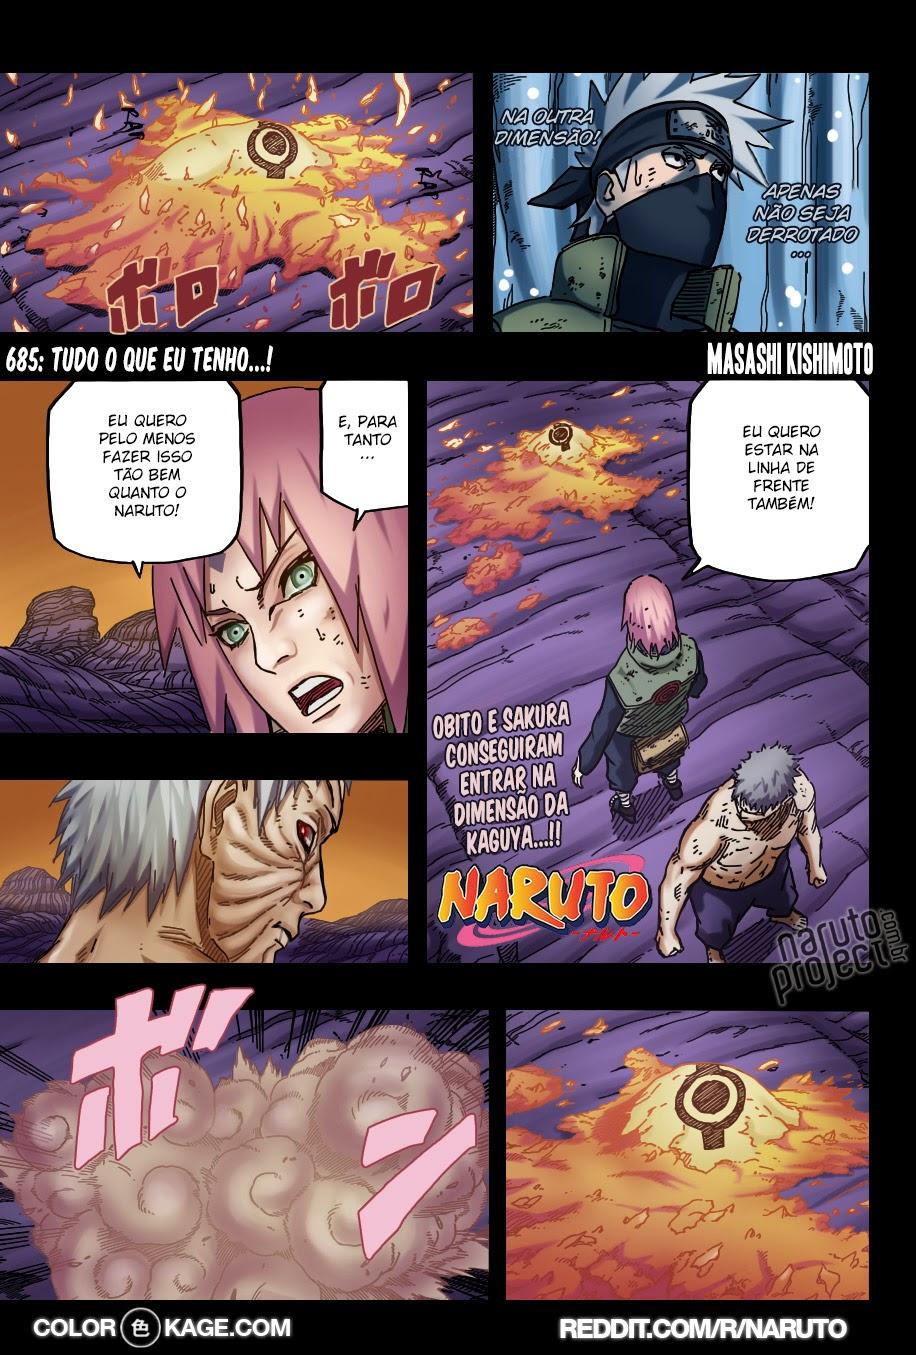 Naruto 685 Mangá Colorido